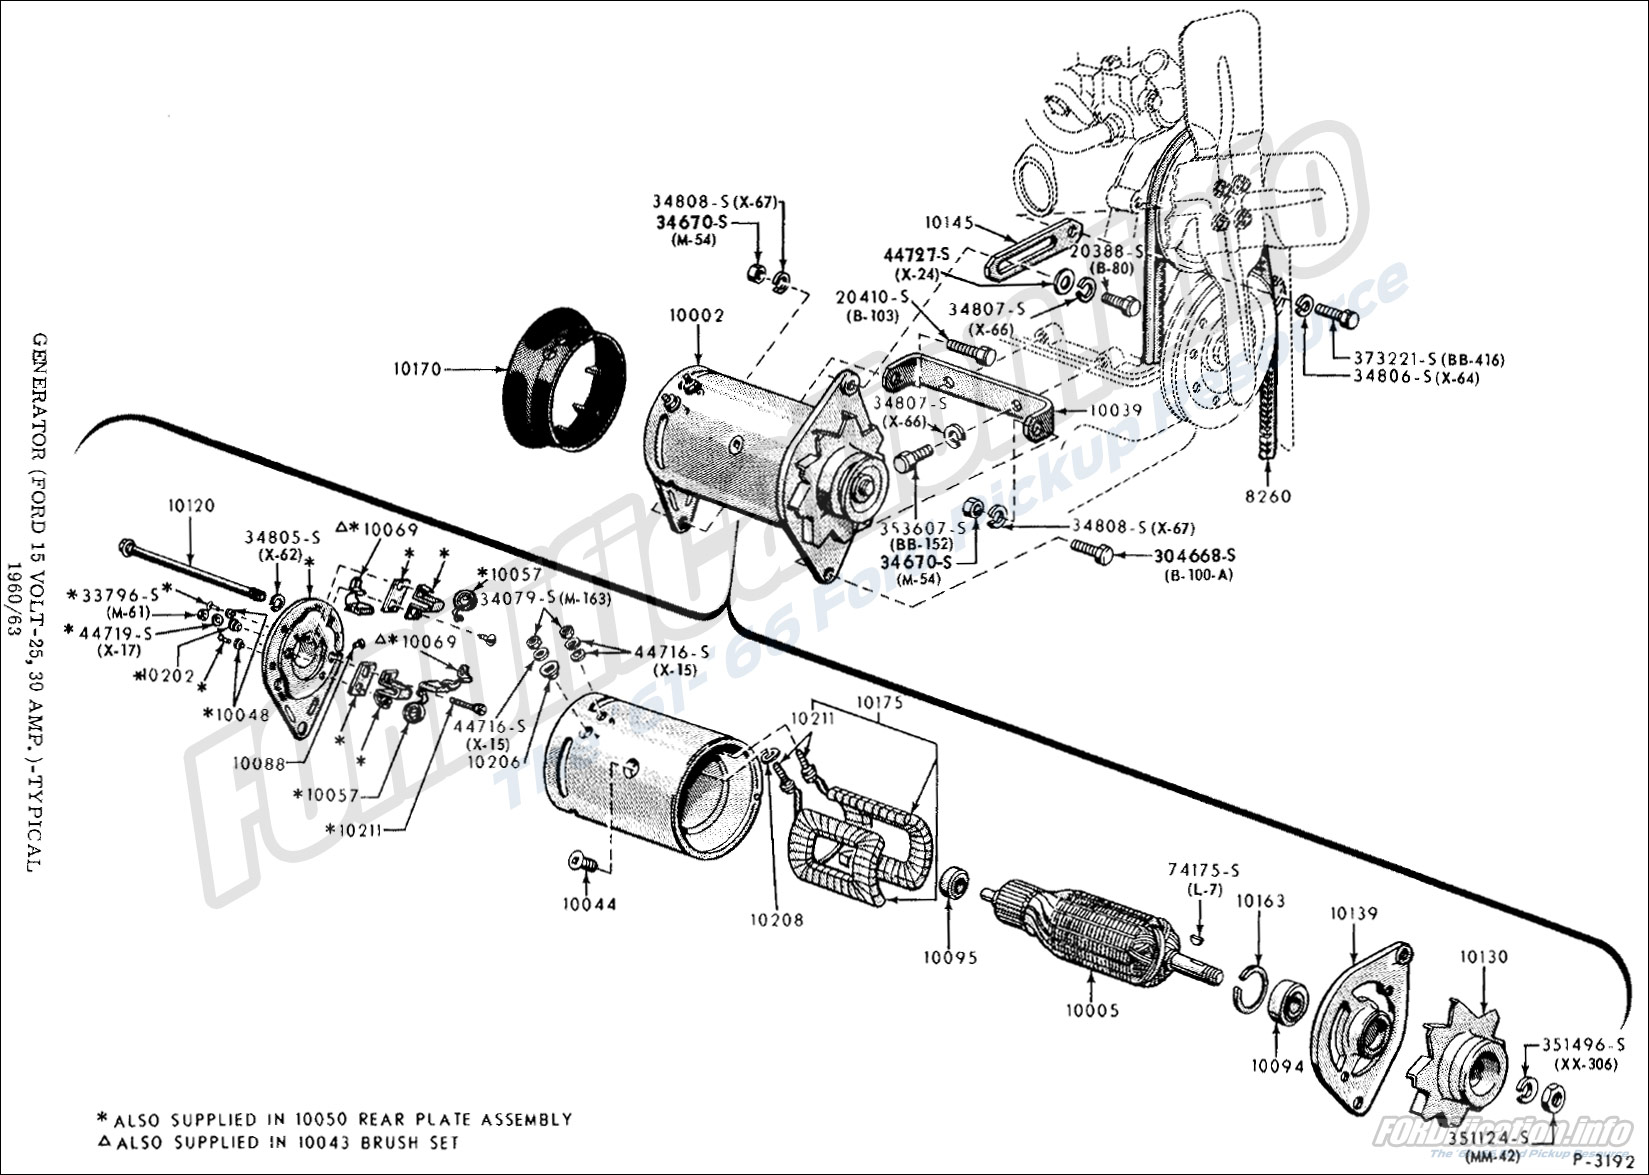 30 generator plug wiring diagram as well solar panel wiring diagram